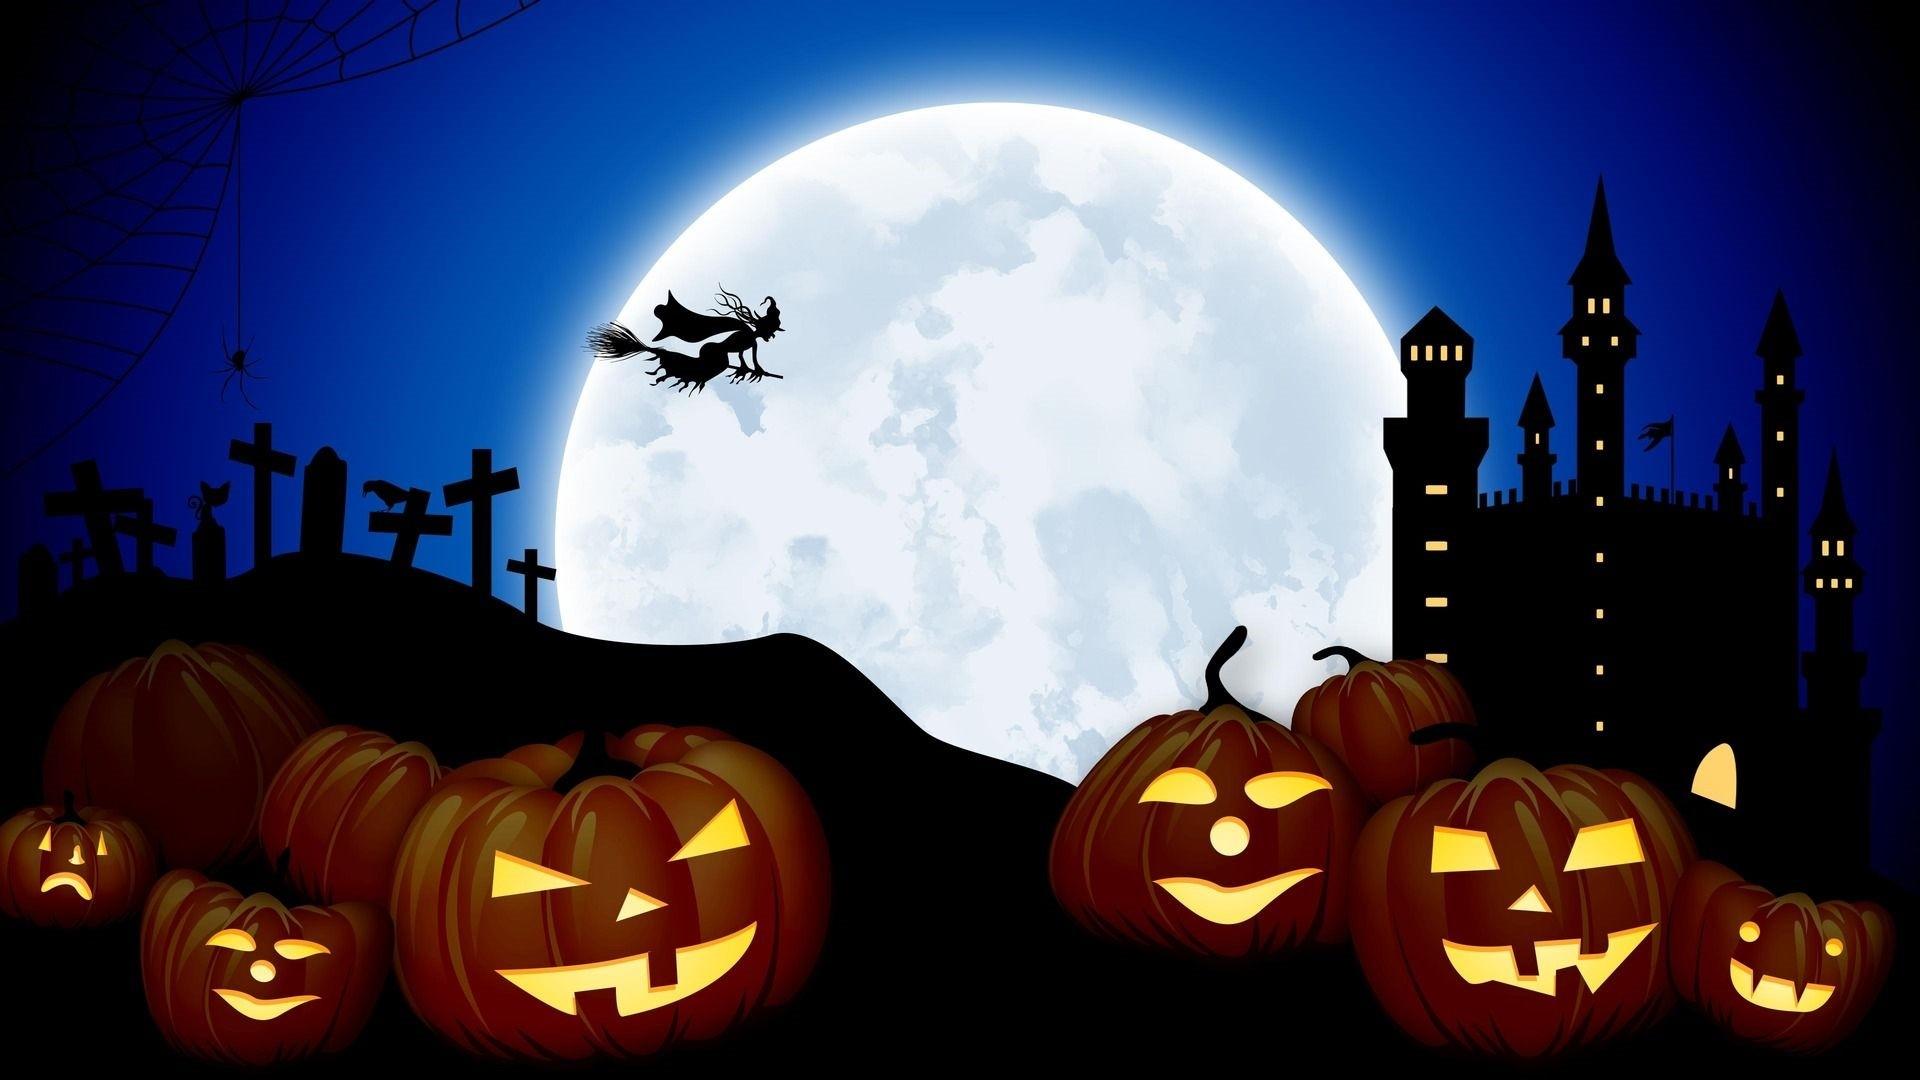 Halloween Wallpaper Picture hd